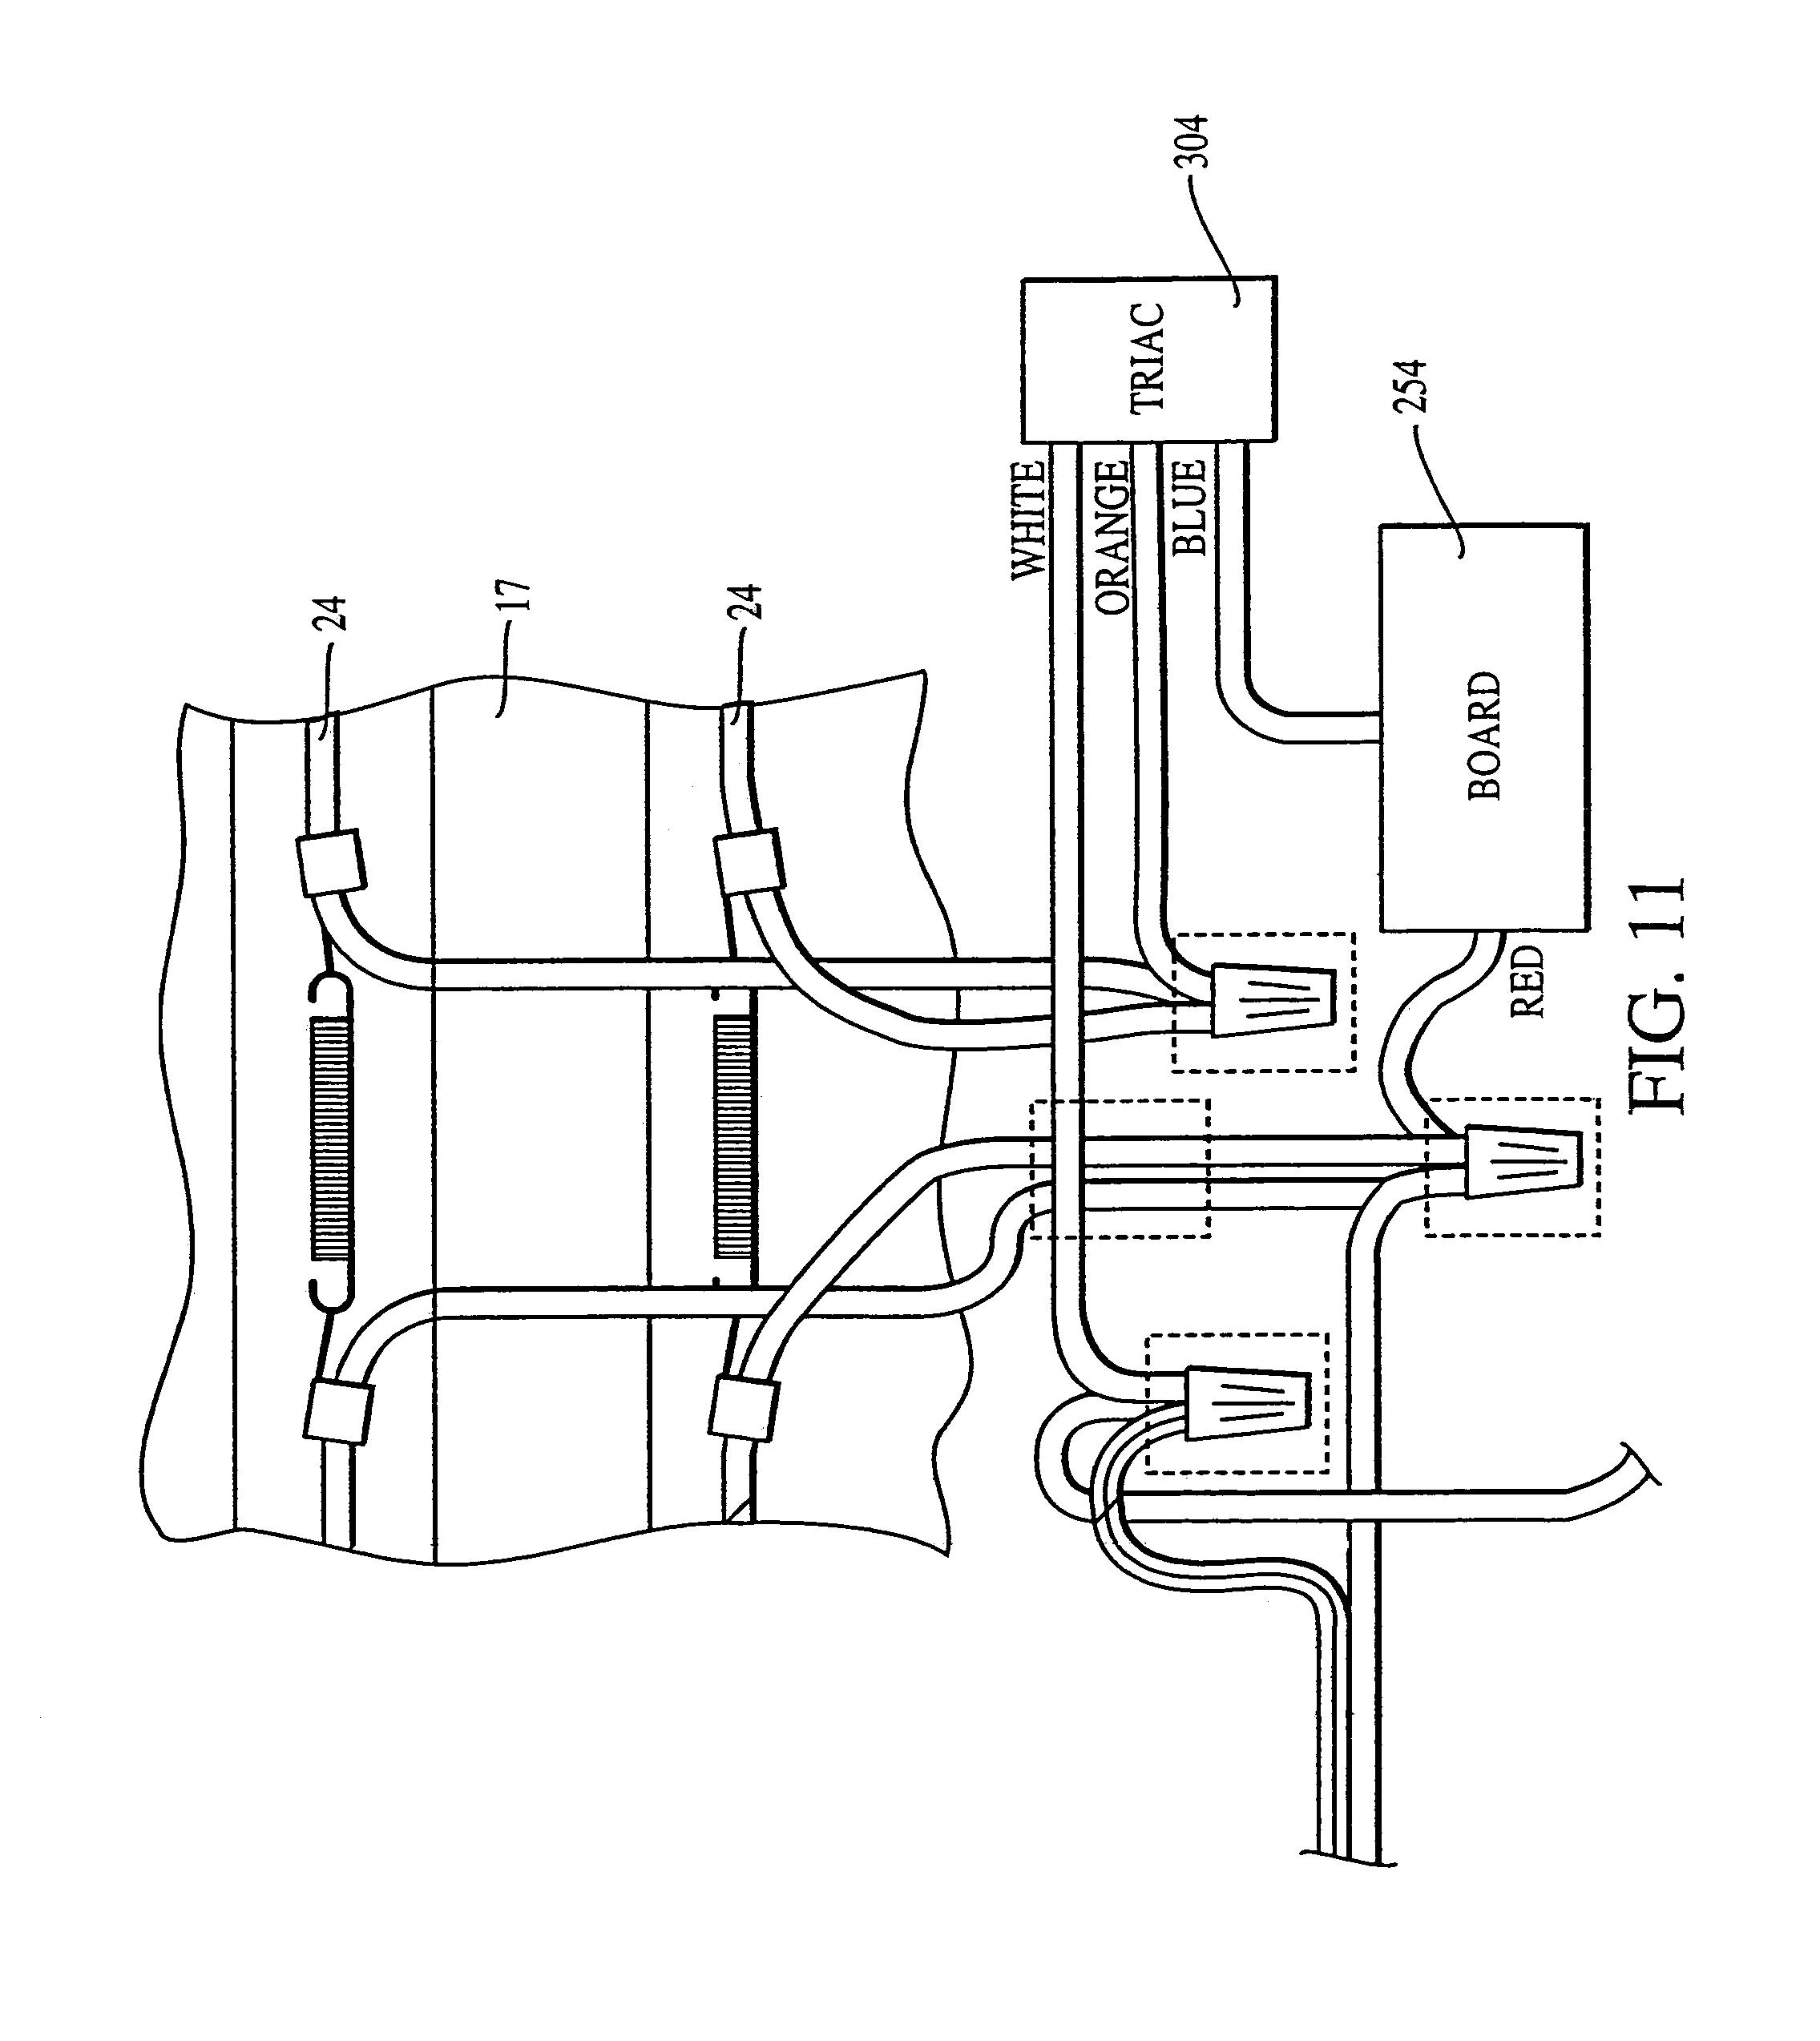 skutt wiring diagram peterson wiring diagram wiring